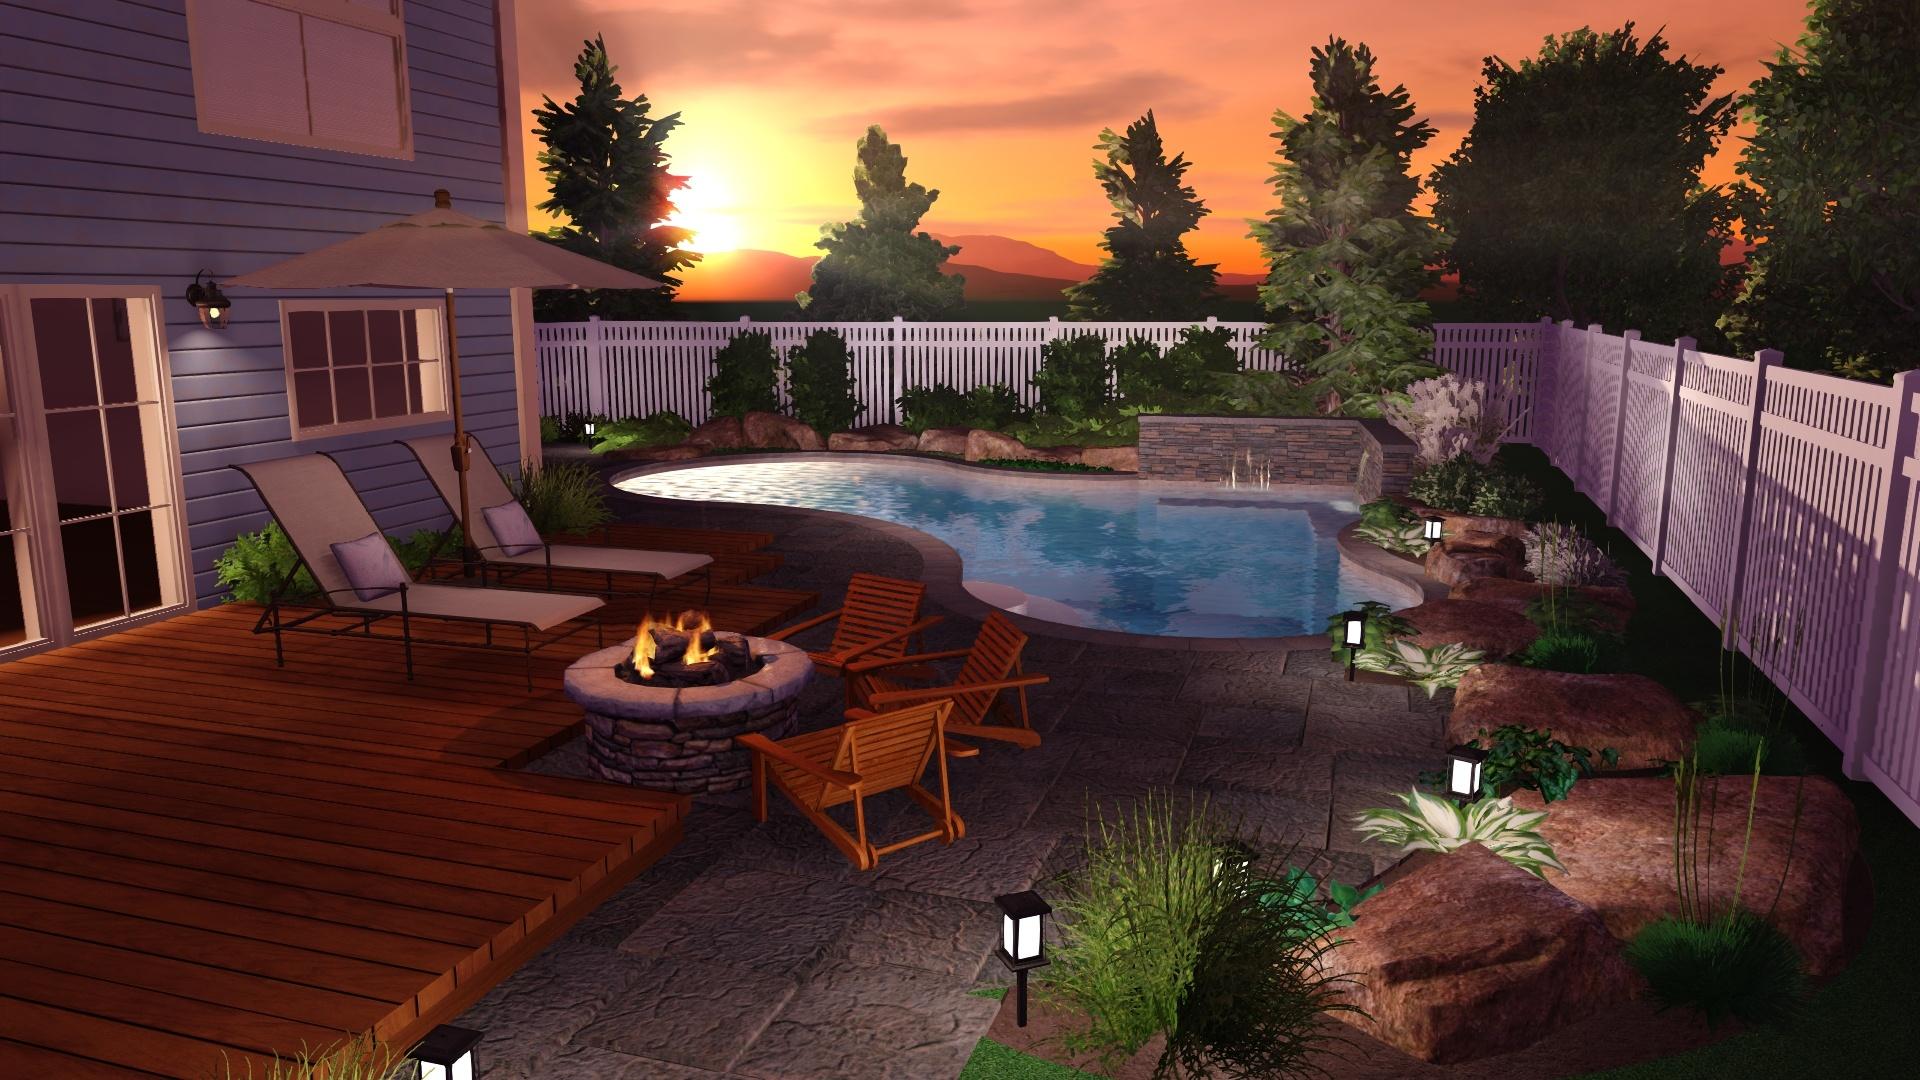 Best free pool design software images interior design for Pool design software free download